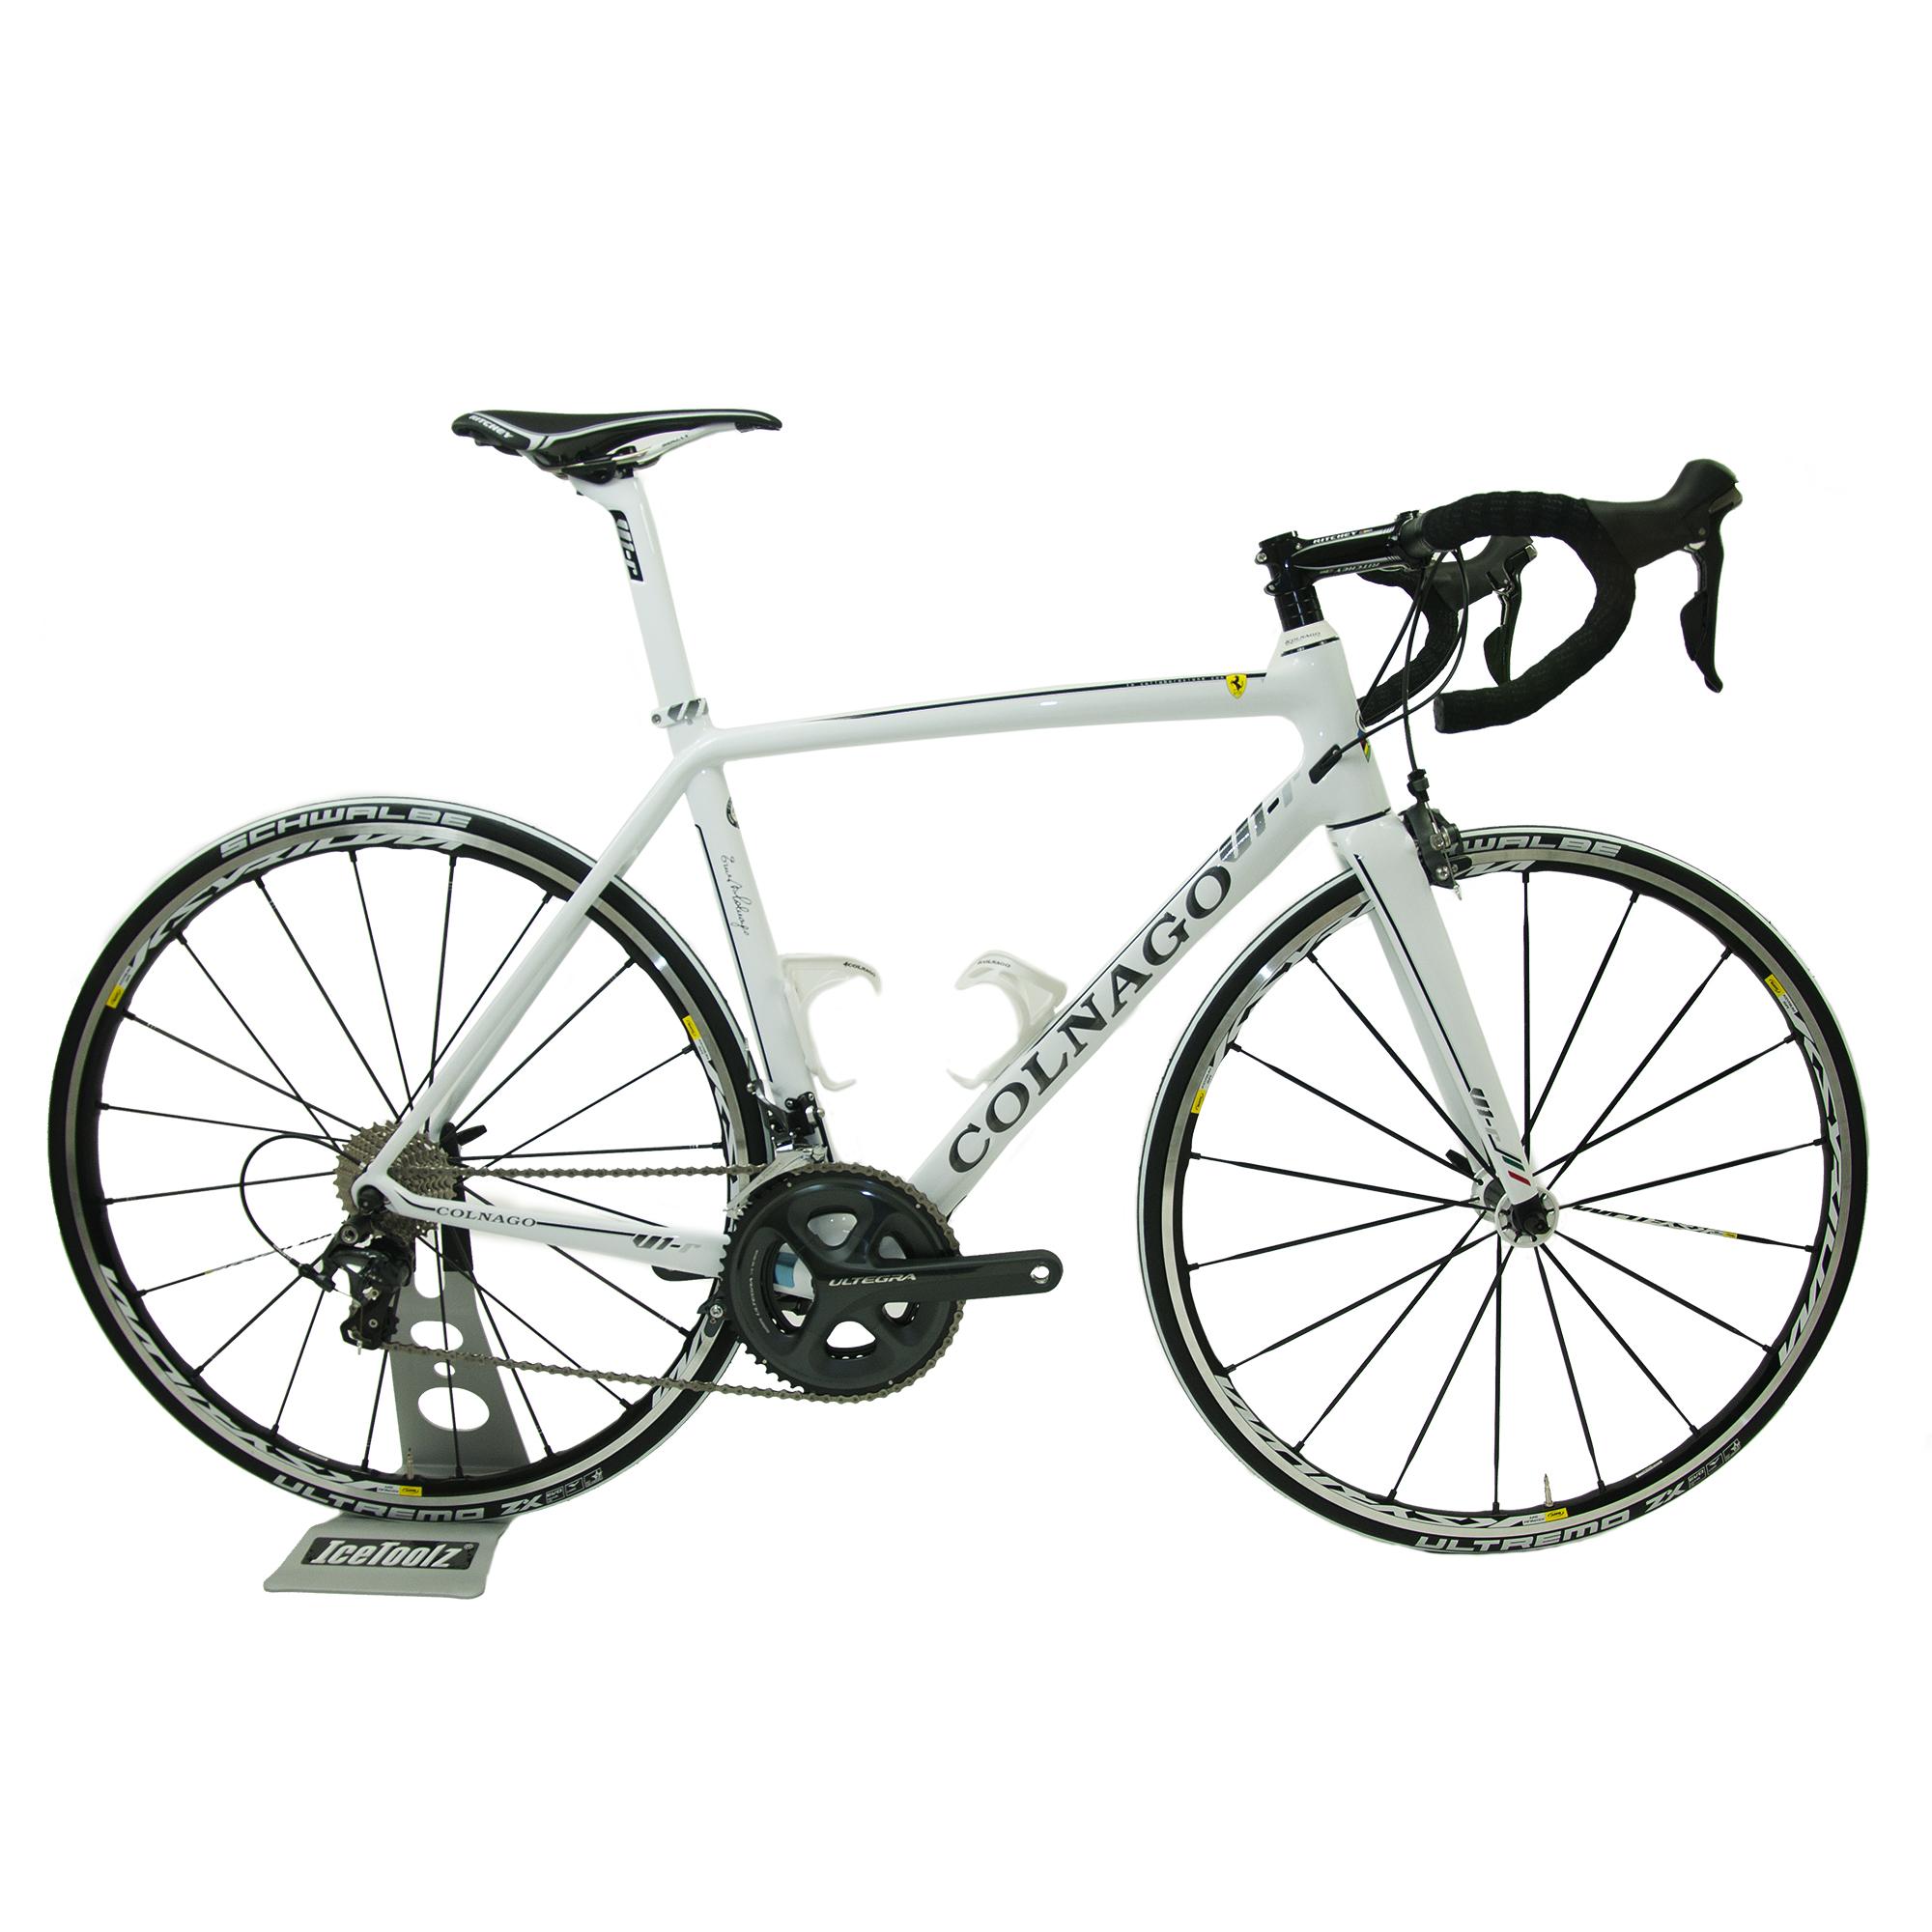 buy bikes online bicycle deals at bike discount online